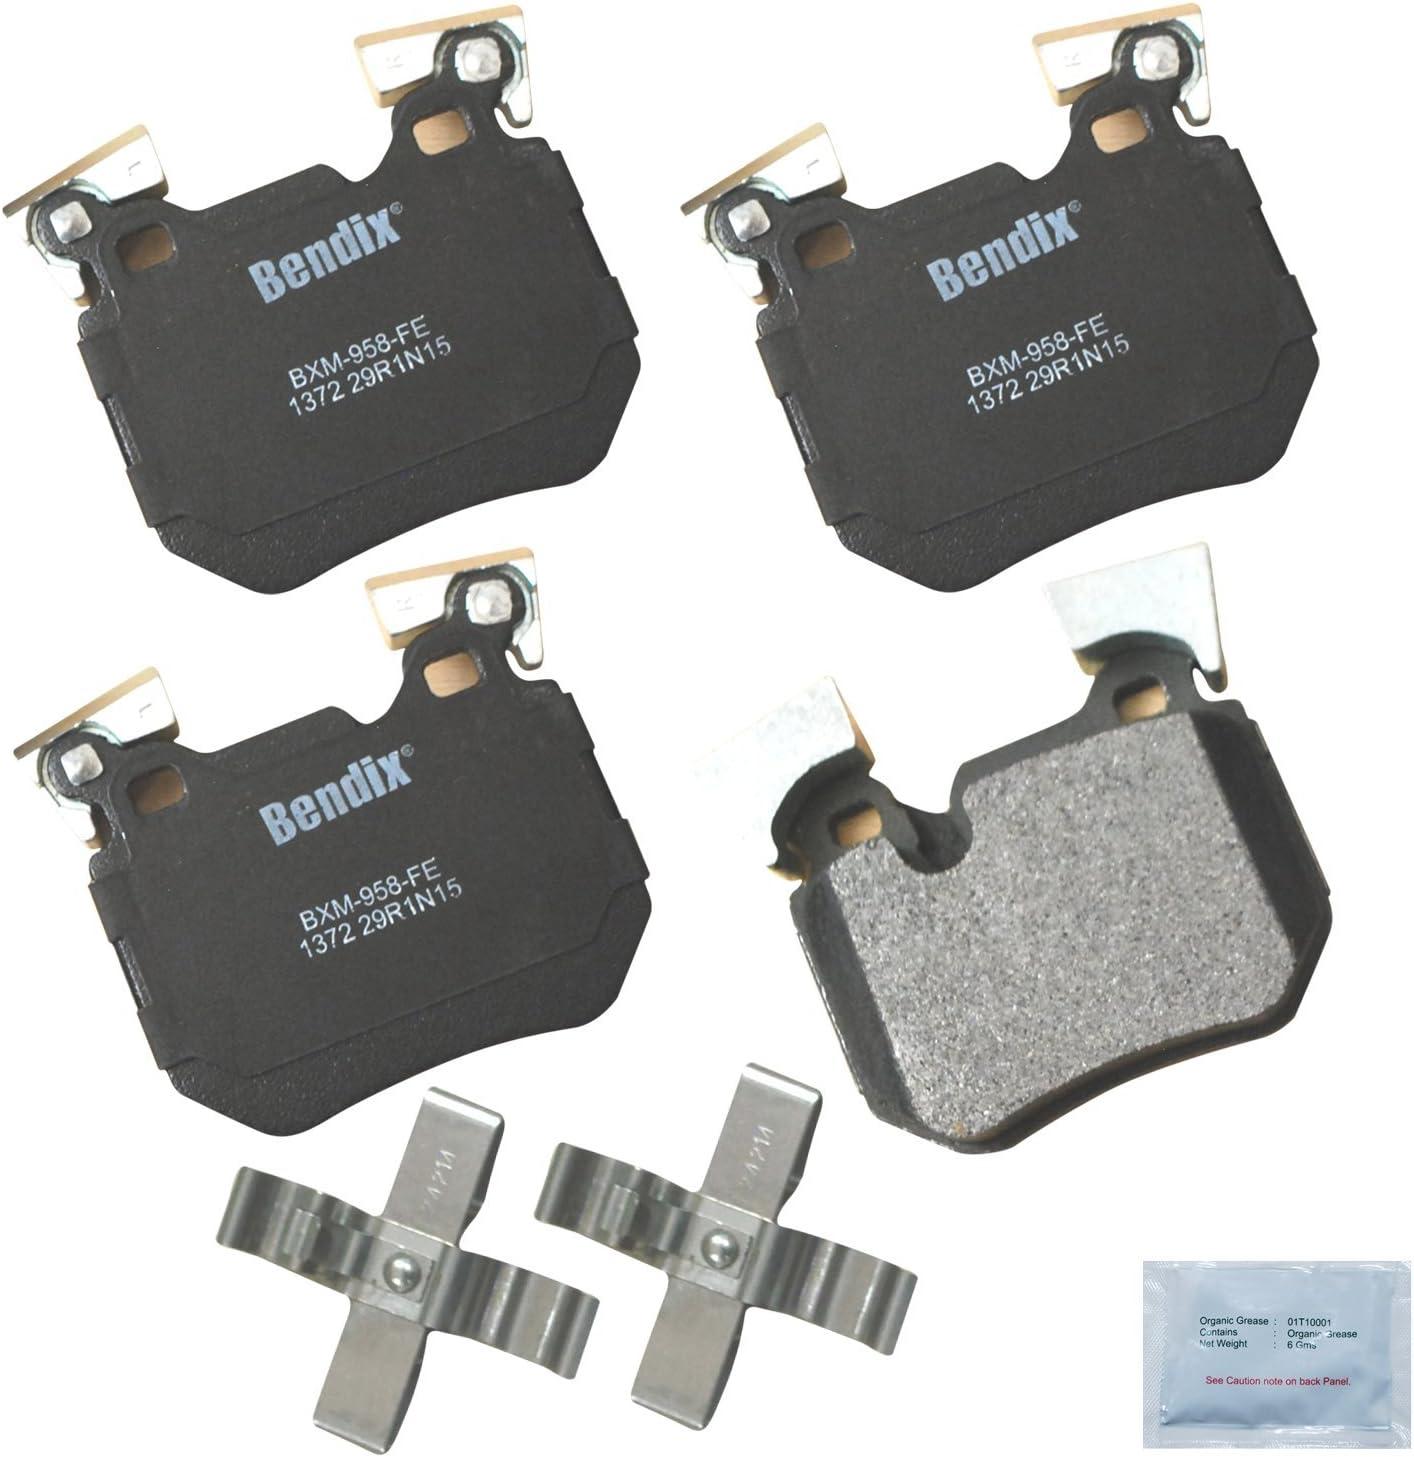 Bendix Premium Copper Free CFM1372 Premium Copper Free Semi-Metallic Brake Pad with Installation Hardware Rear